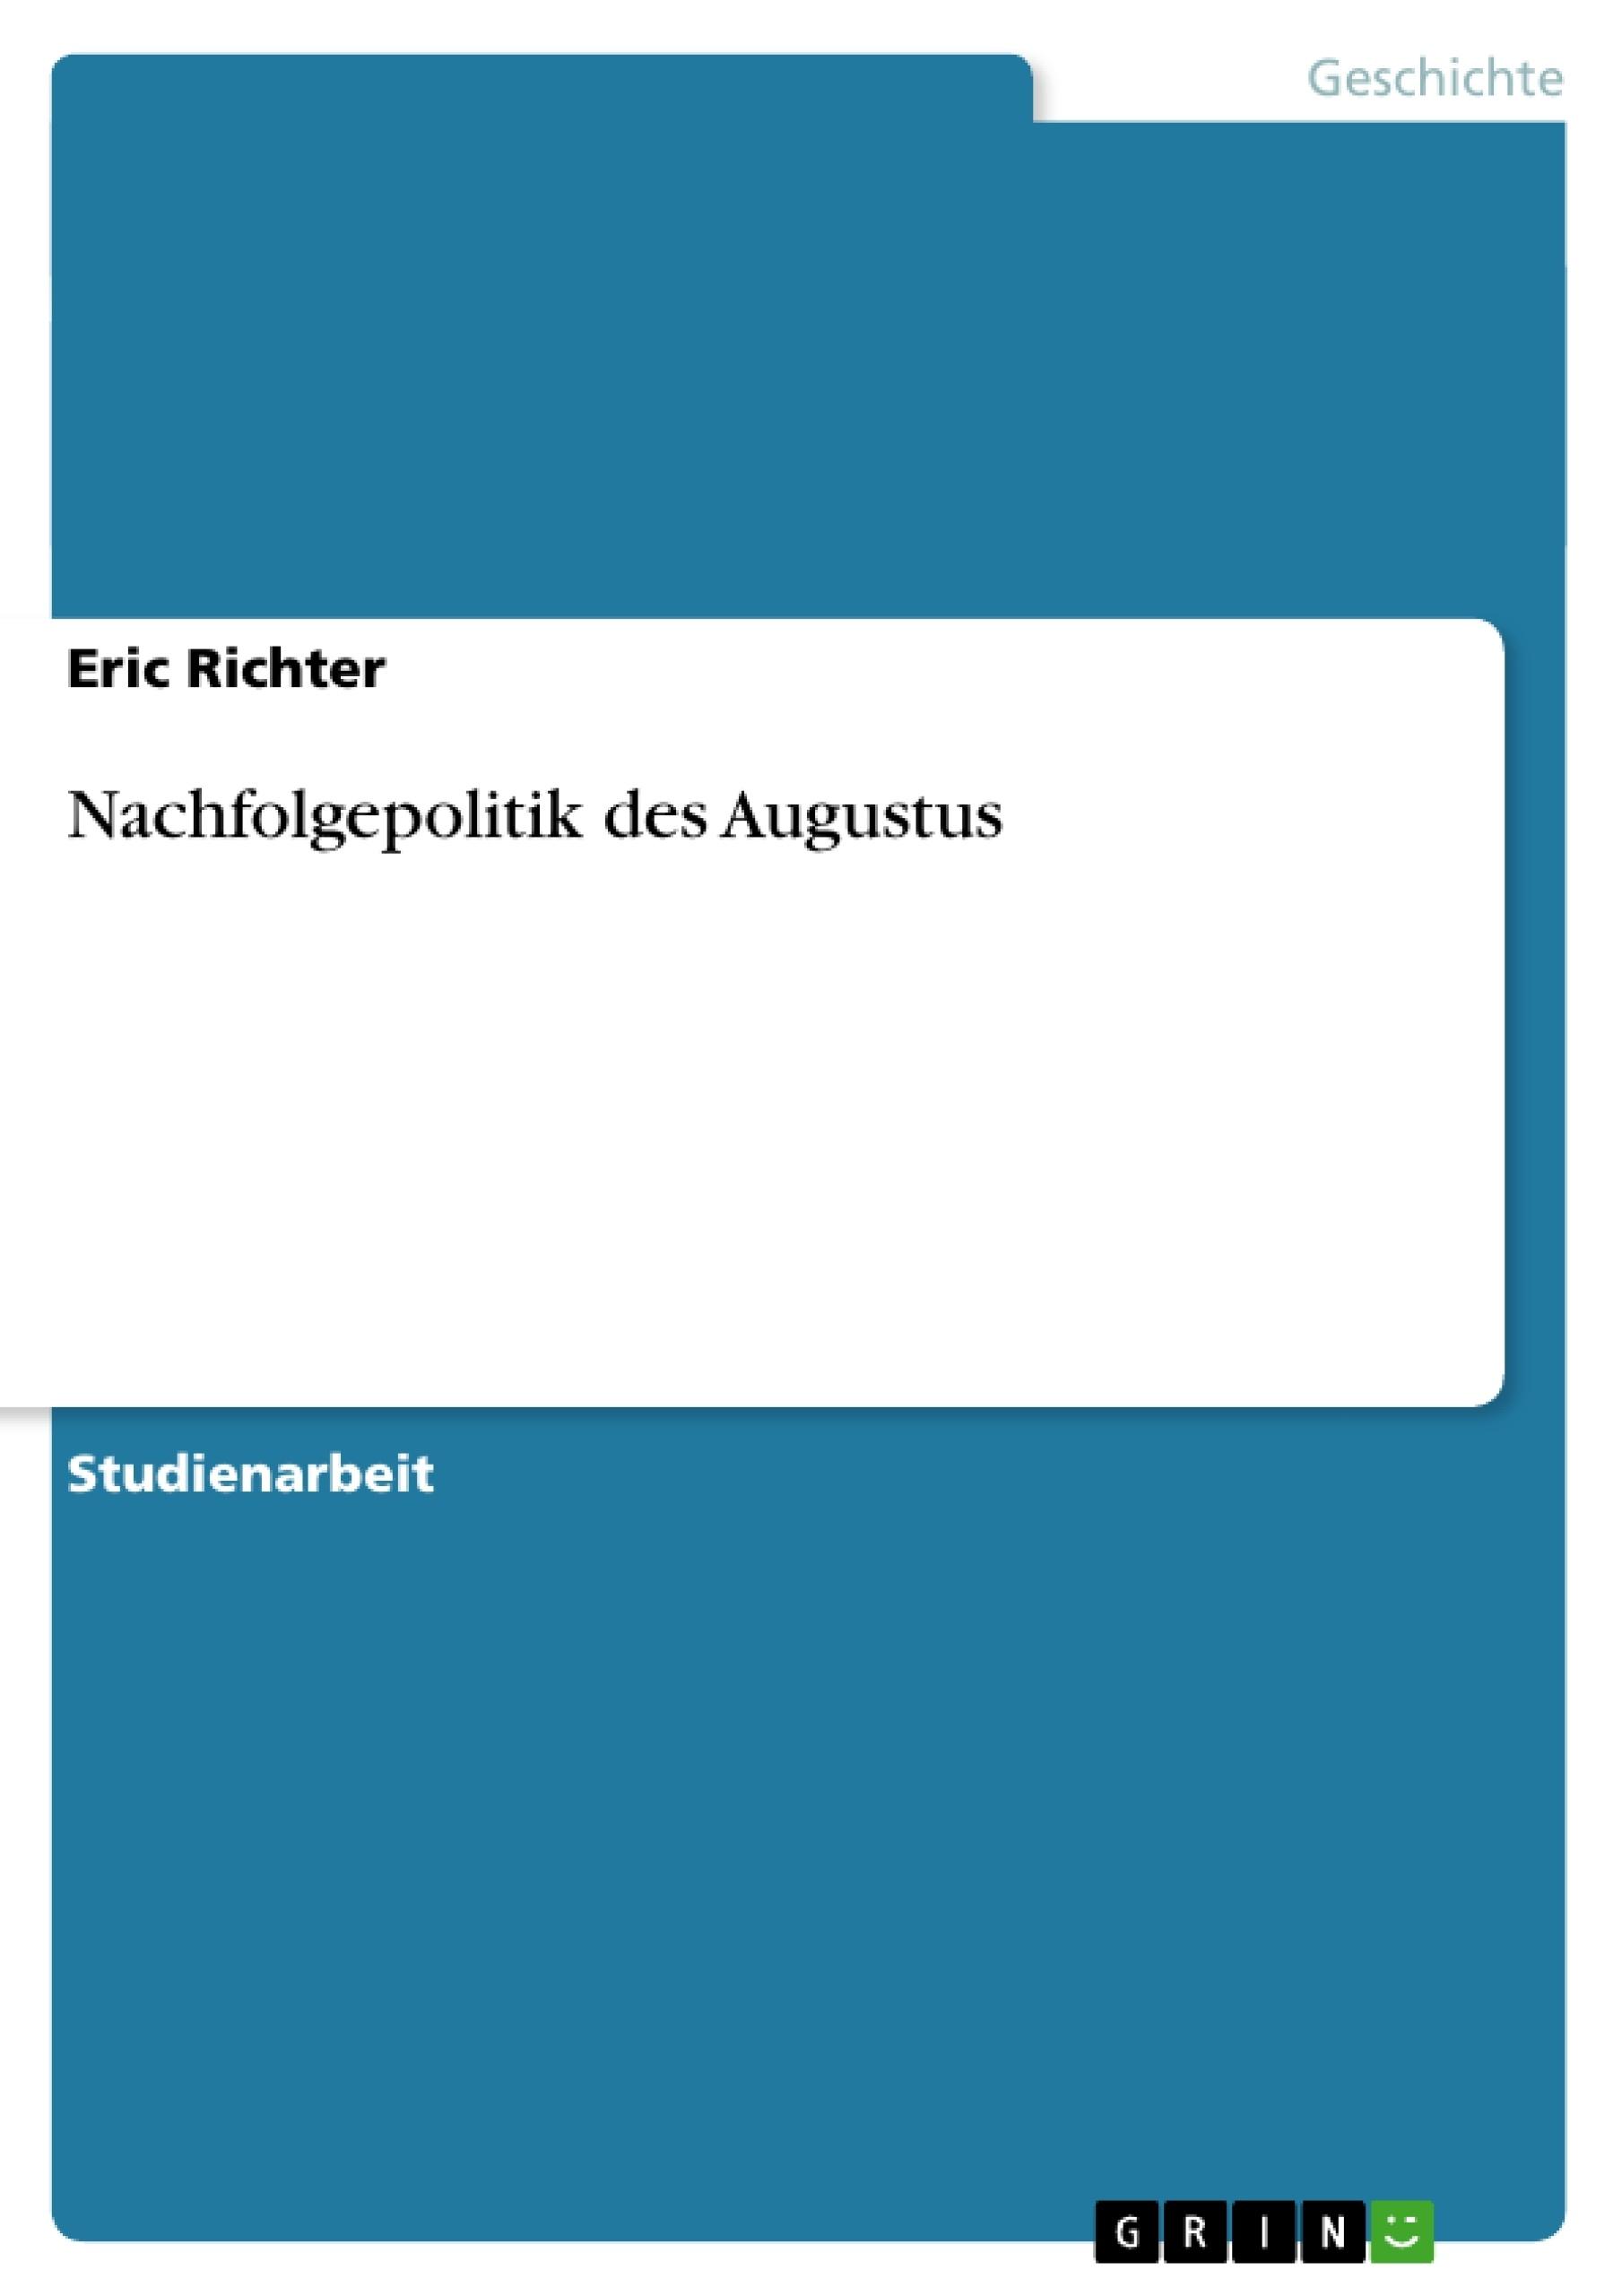 Titel: Nachfolgepolitik des Augustus